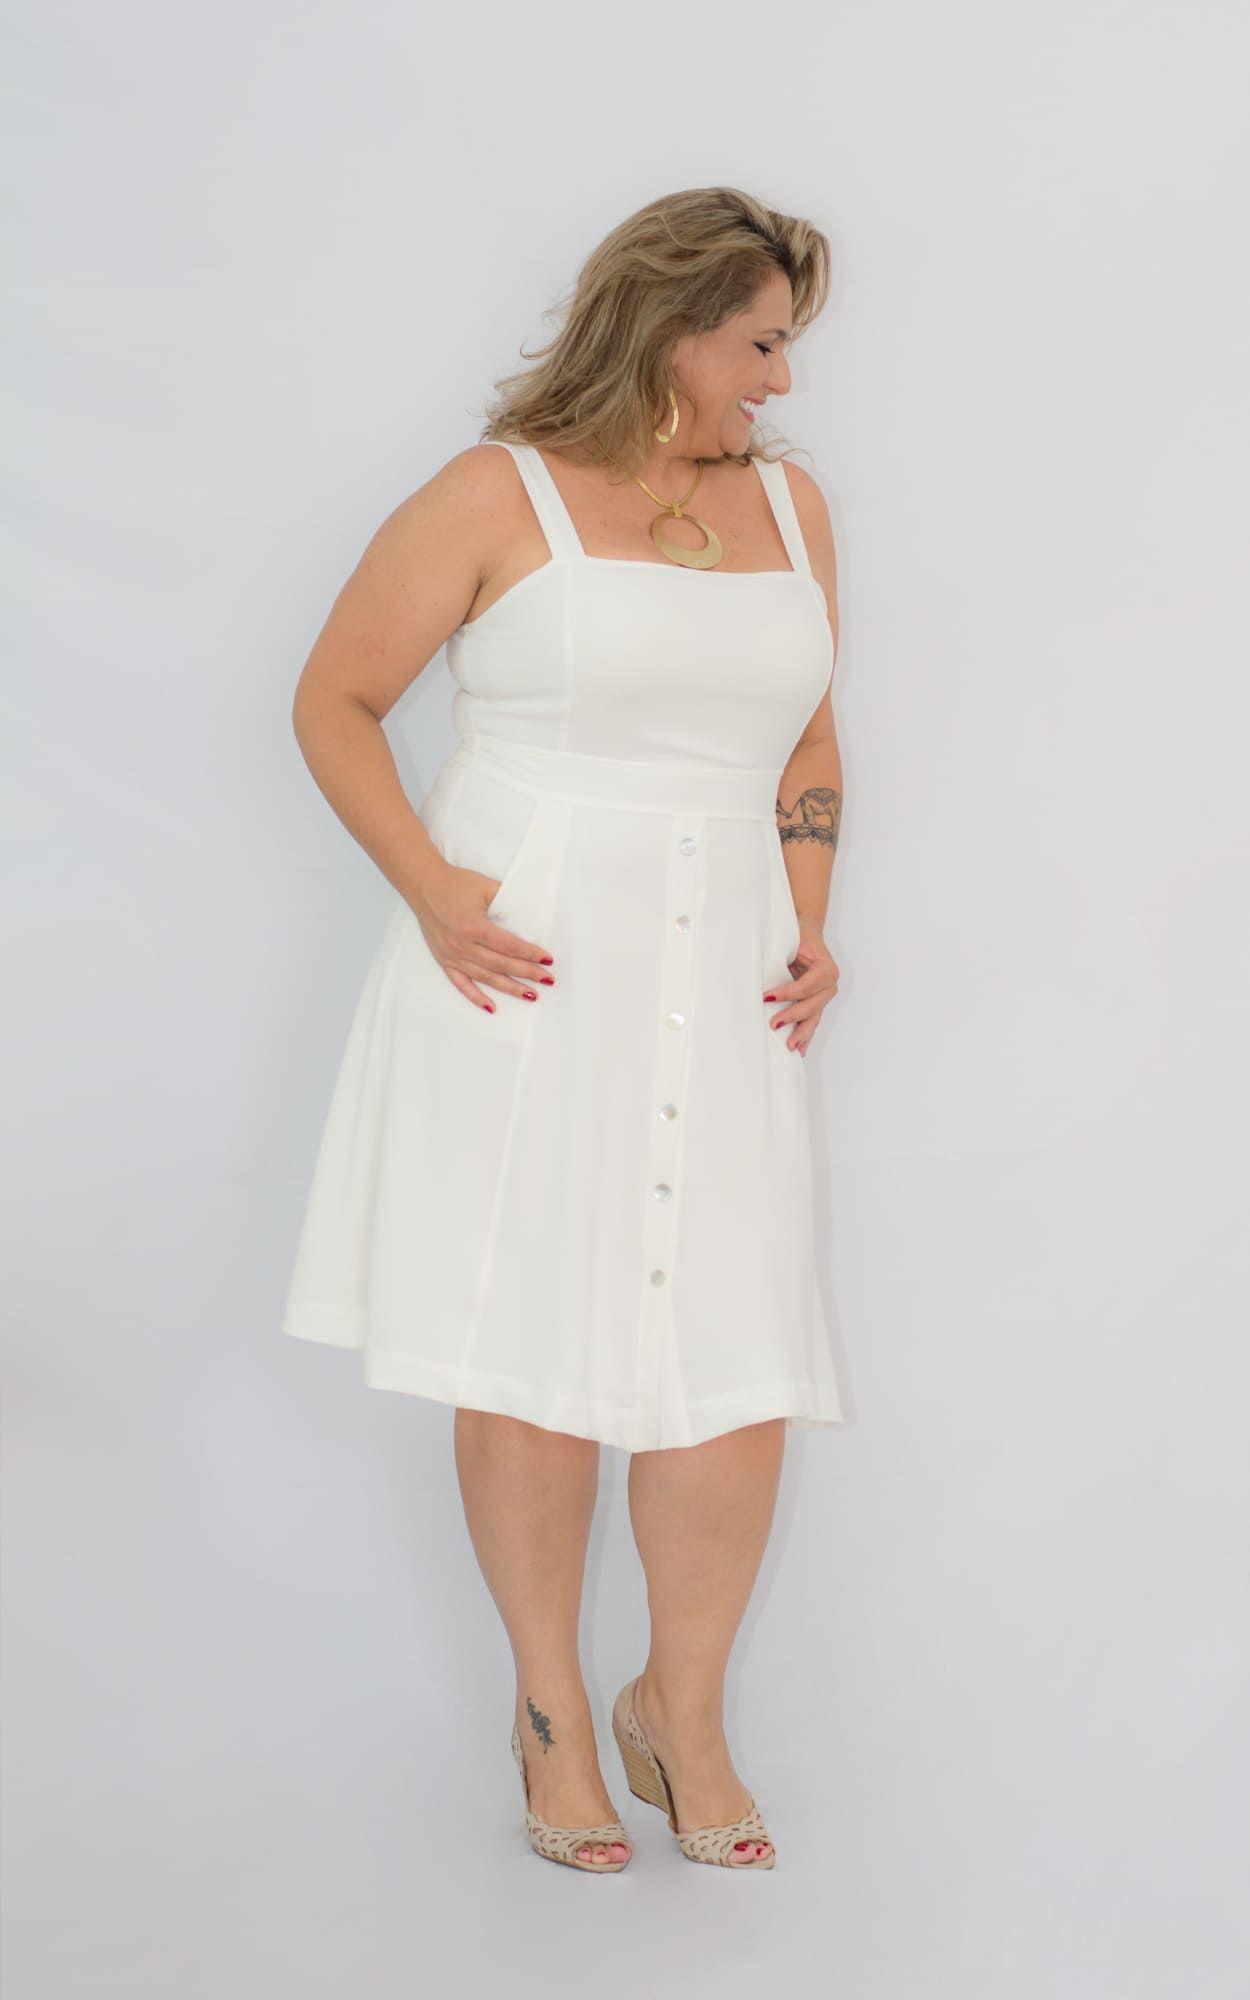 Vestido Curto Plus Size Branco OffCrepe